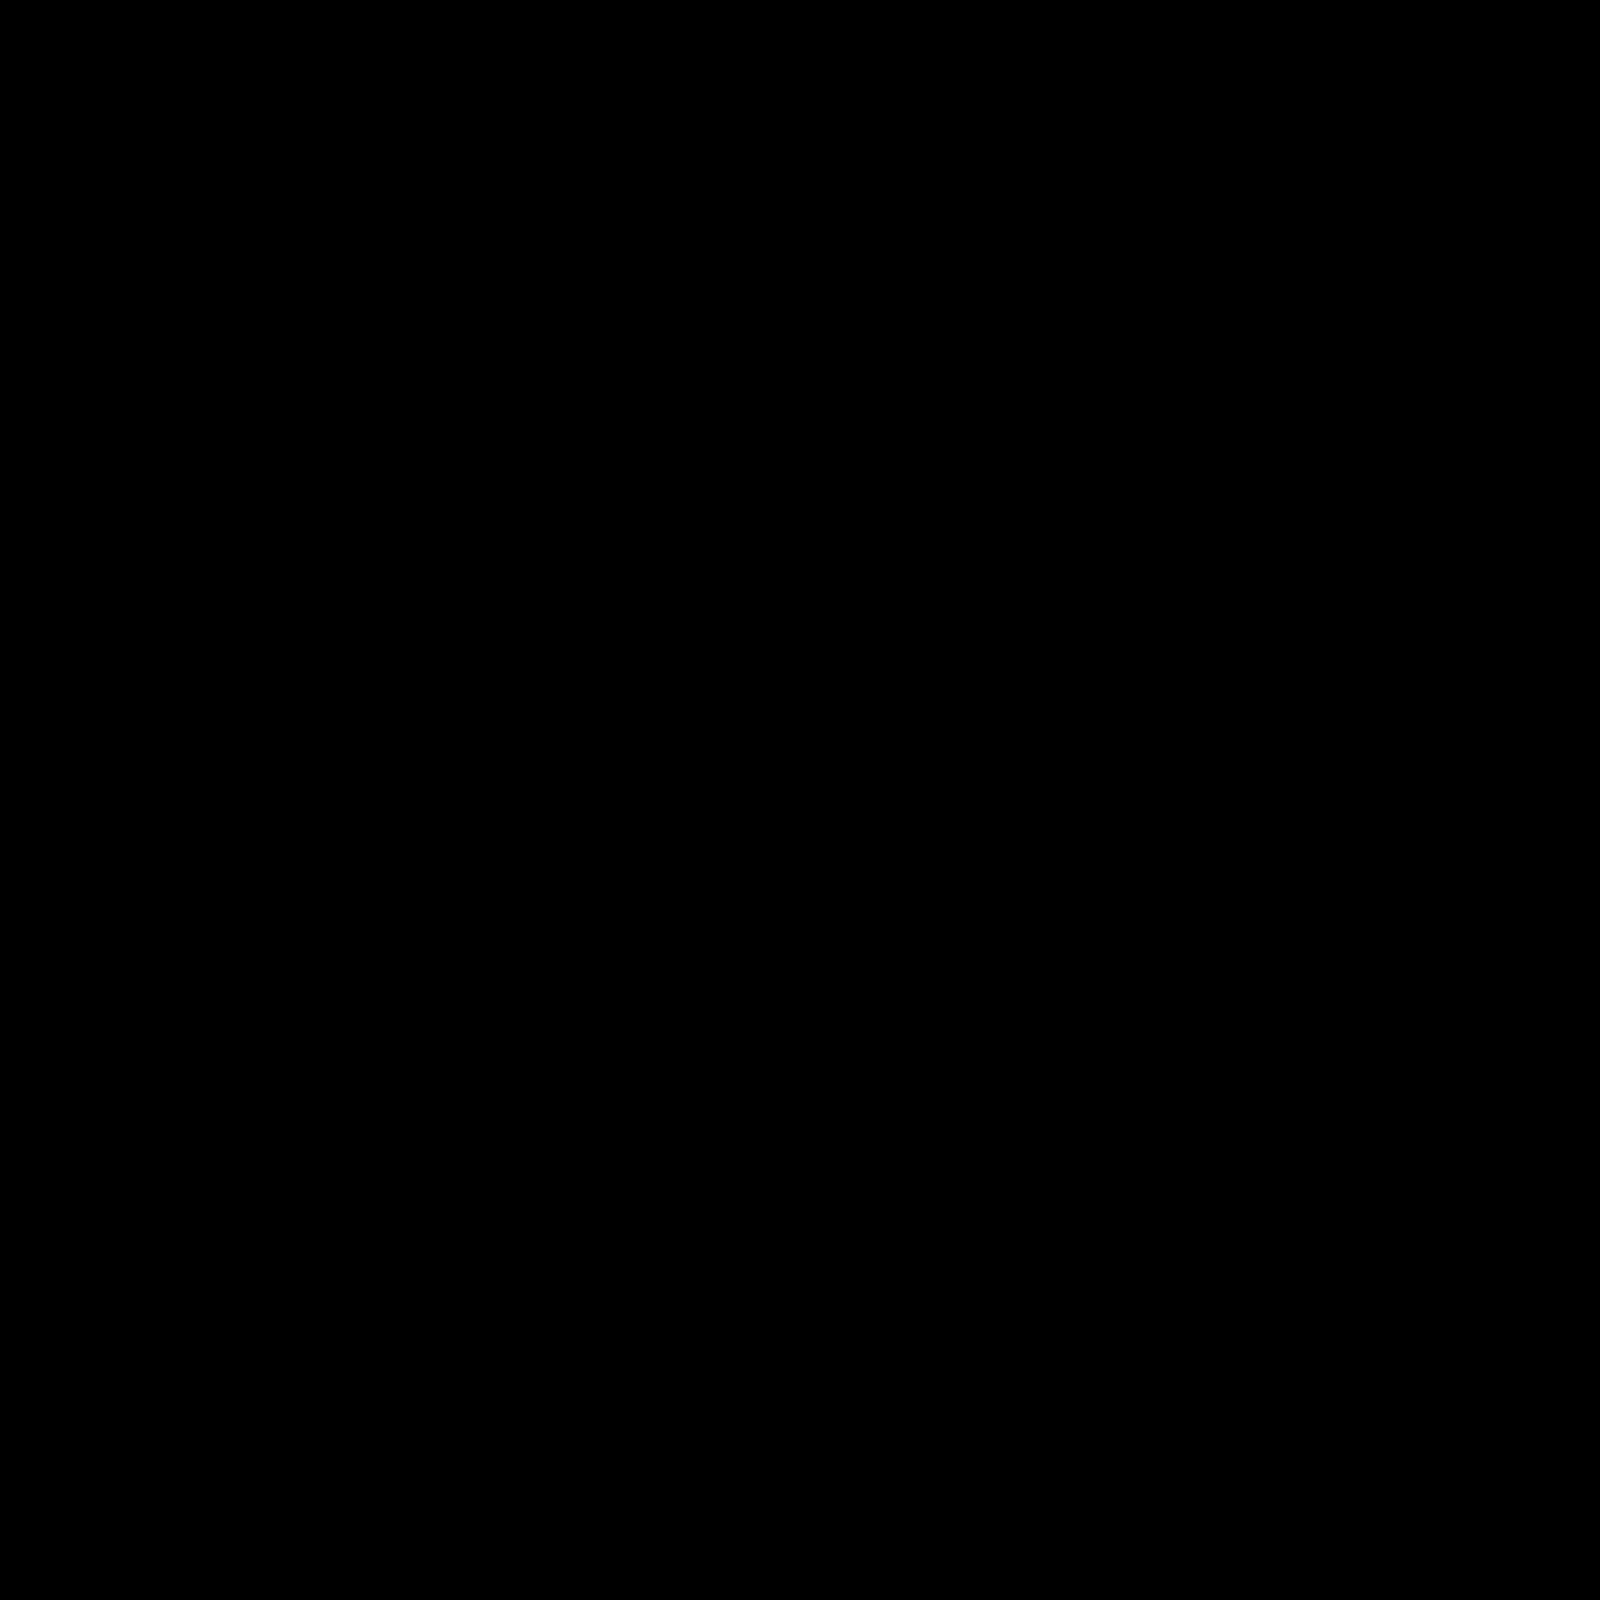 Diamond clipart symbol, Diamond symbol Transparent FREE for.